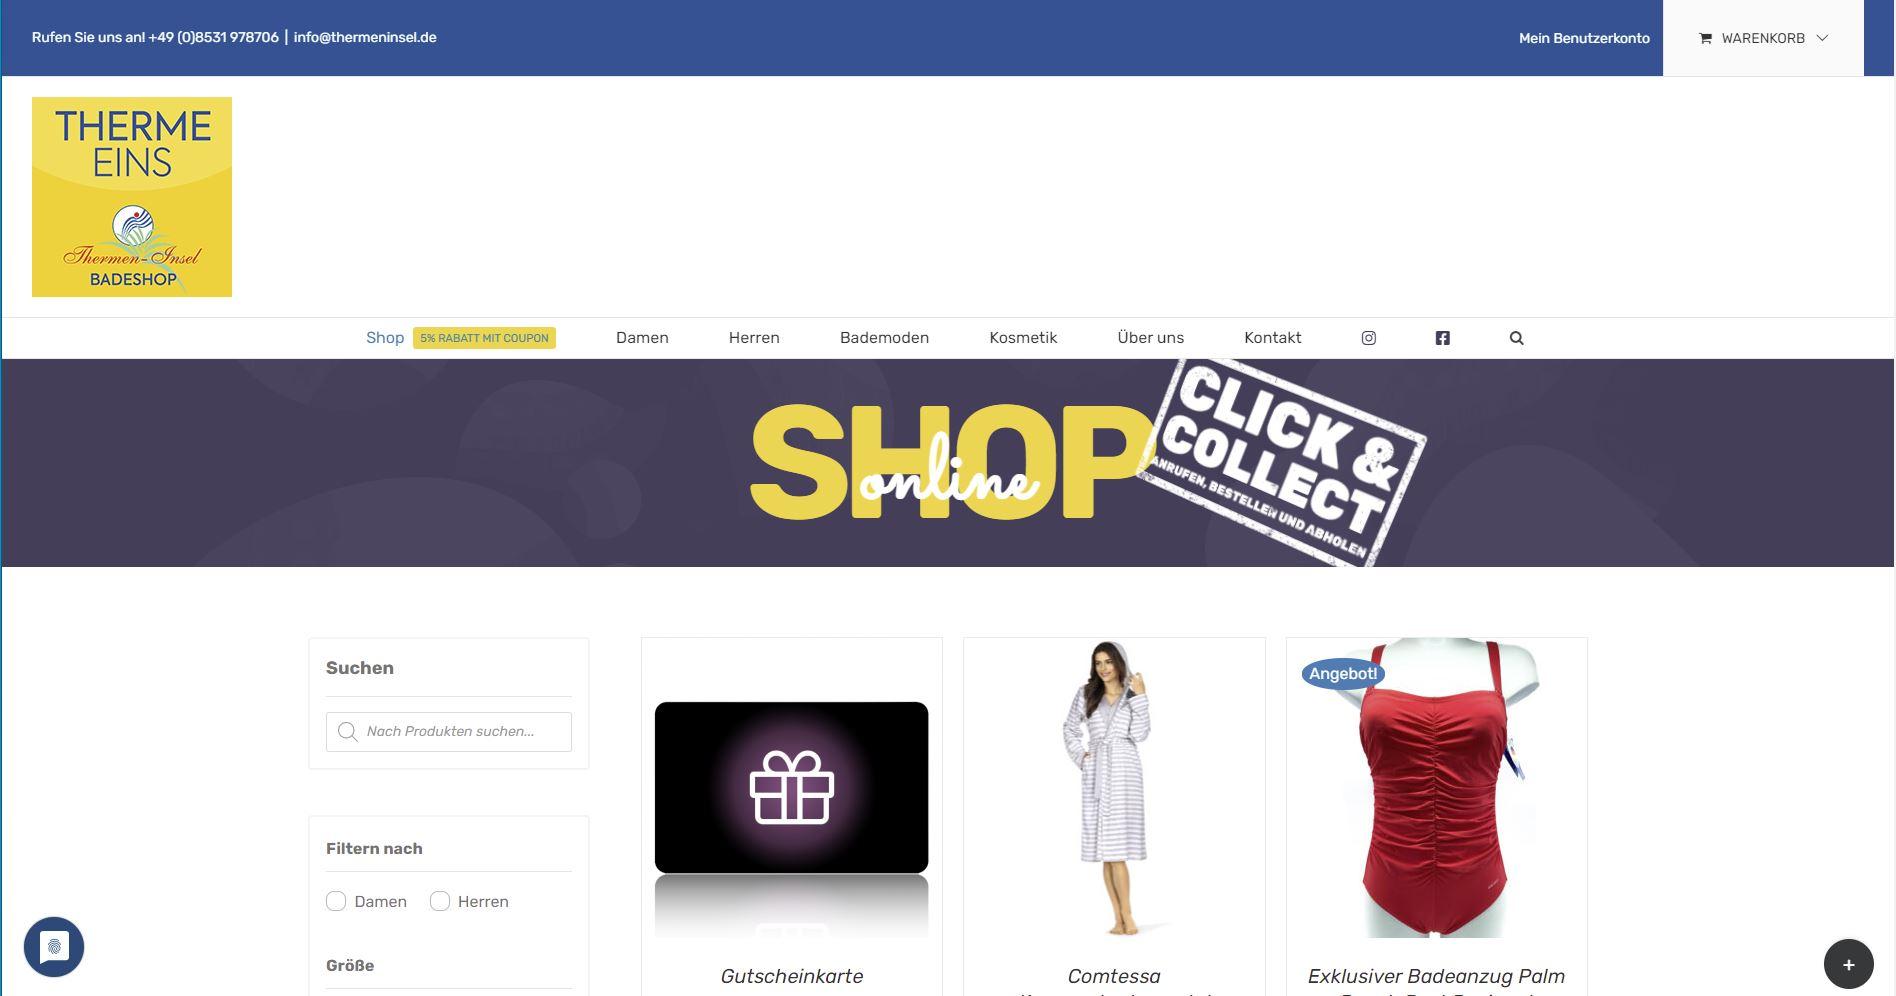 Online Shop Thermeninsel Bad Füssing